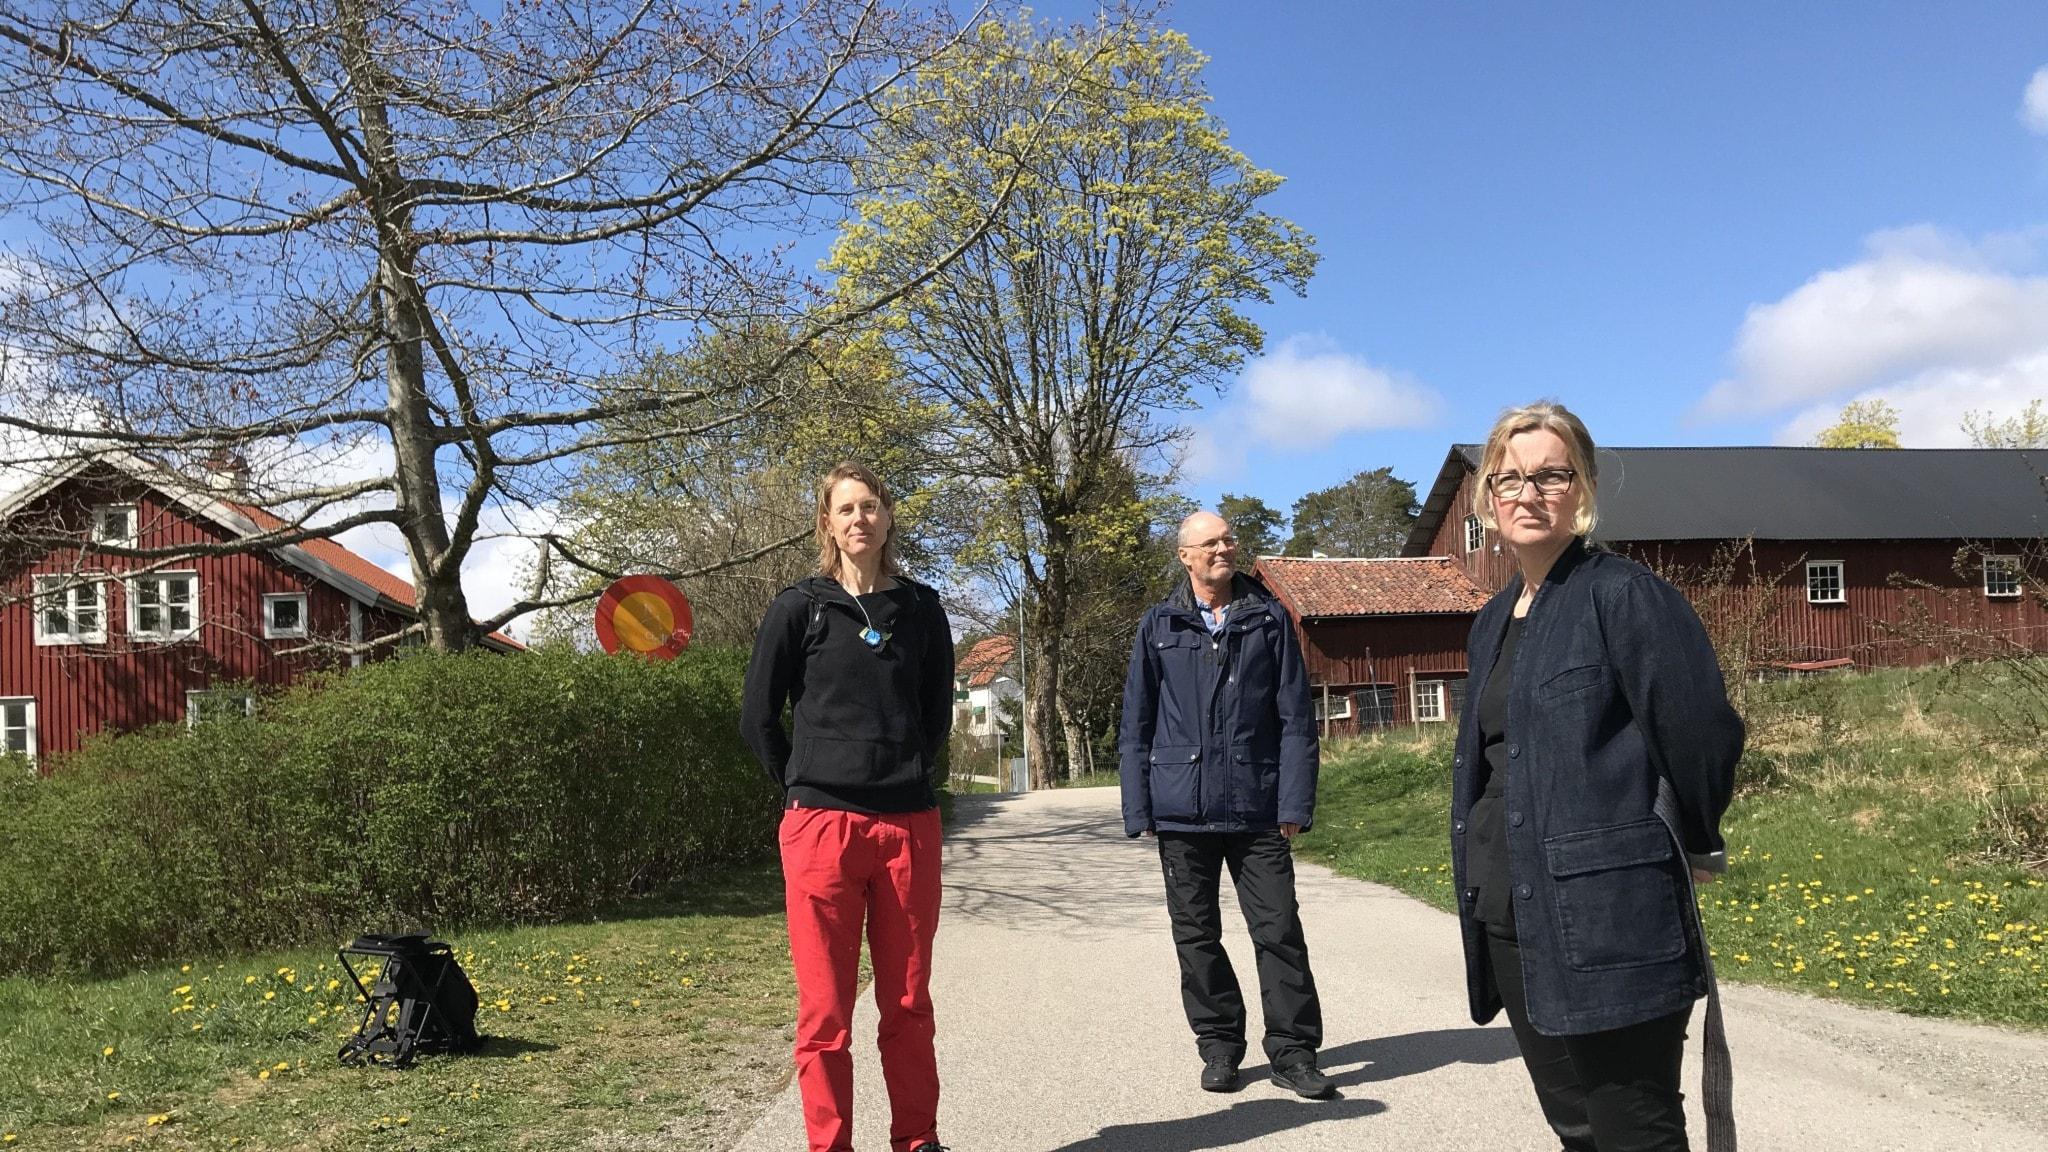 Linda Vgens, 36 r i Hestra p Jrnvgsgatan 14 - adress